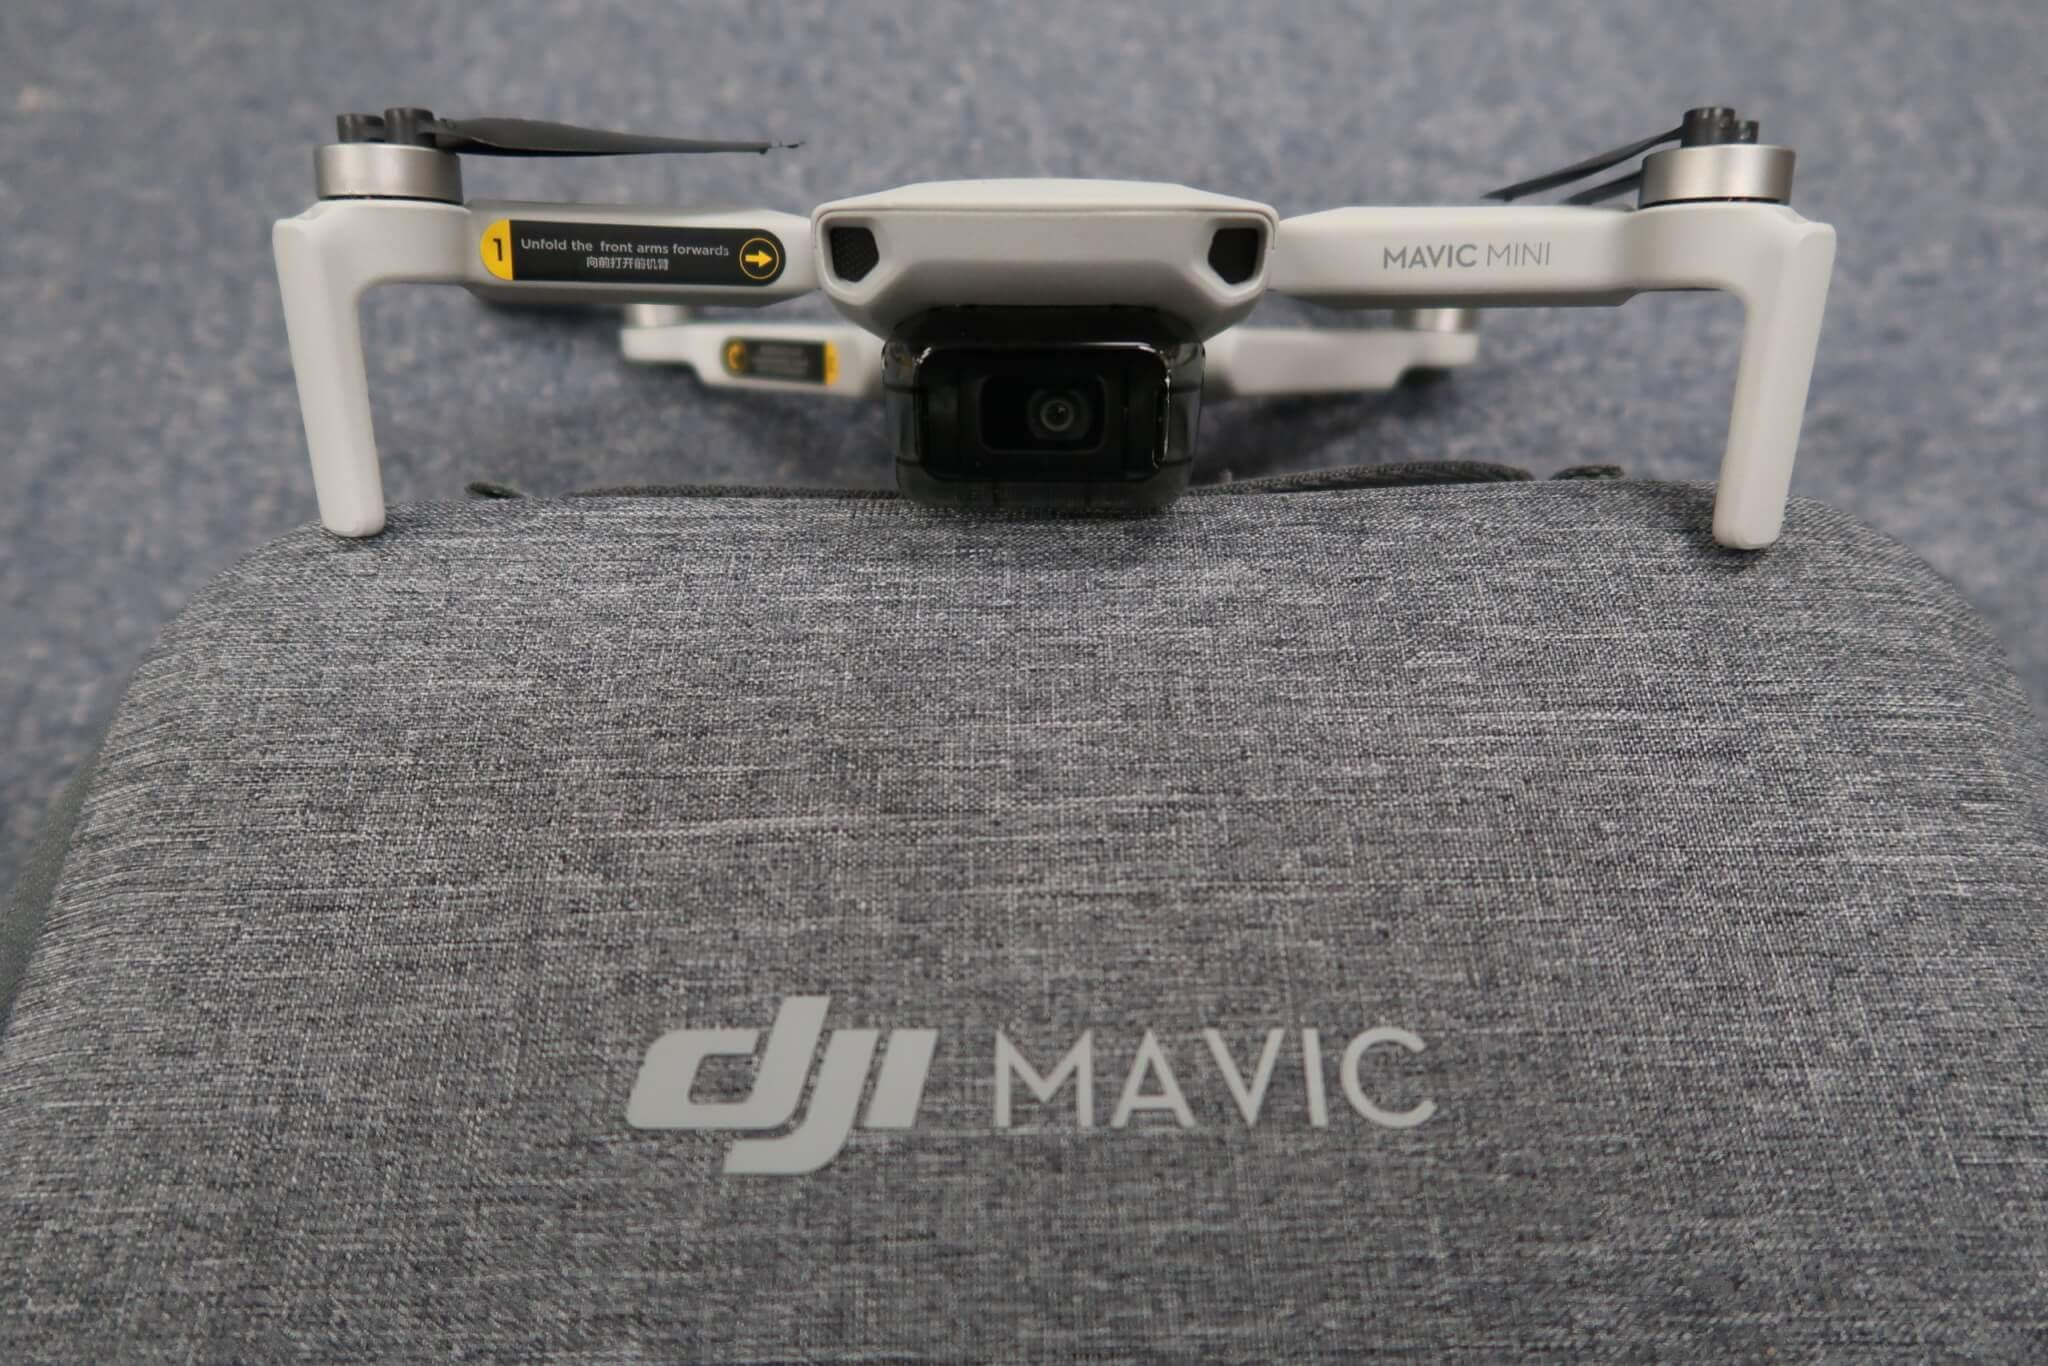 DJI Mavic Mini Fly More コンボ 初期設定~飛行を写真付レビュー!小型ドローン他機種とも比較し実力を検証